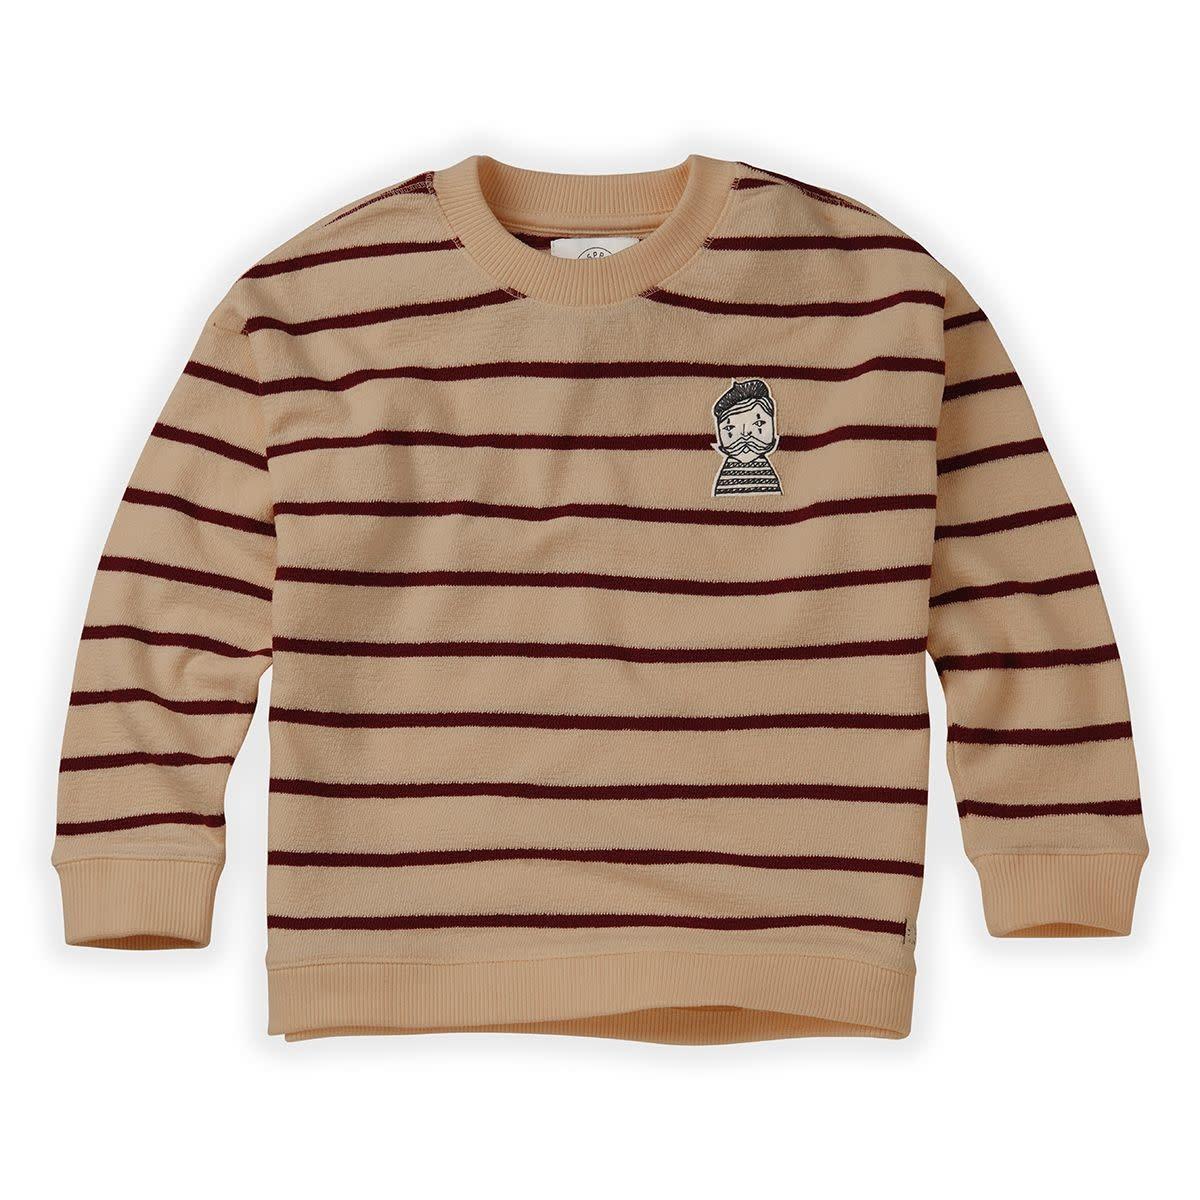 Sproet & Sprout Sproet&Sprout - Sweatshirt loose stripe nougat